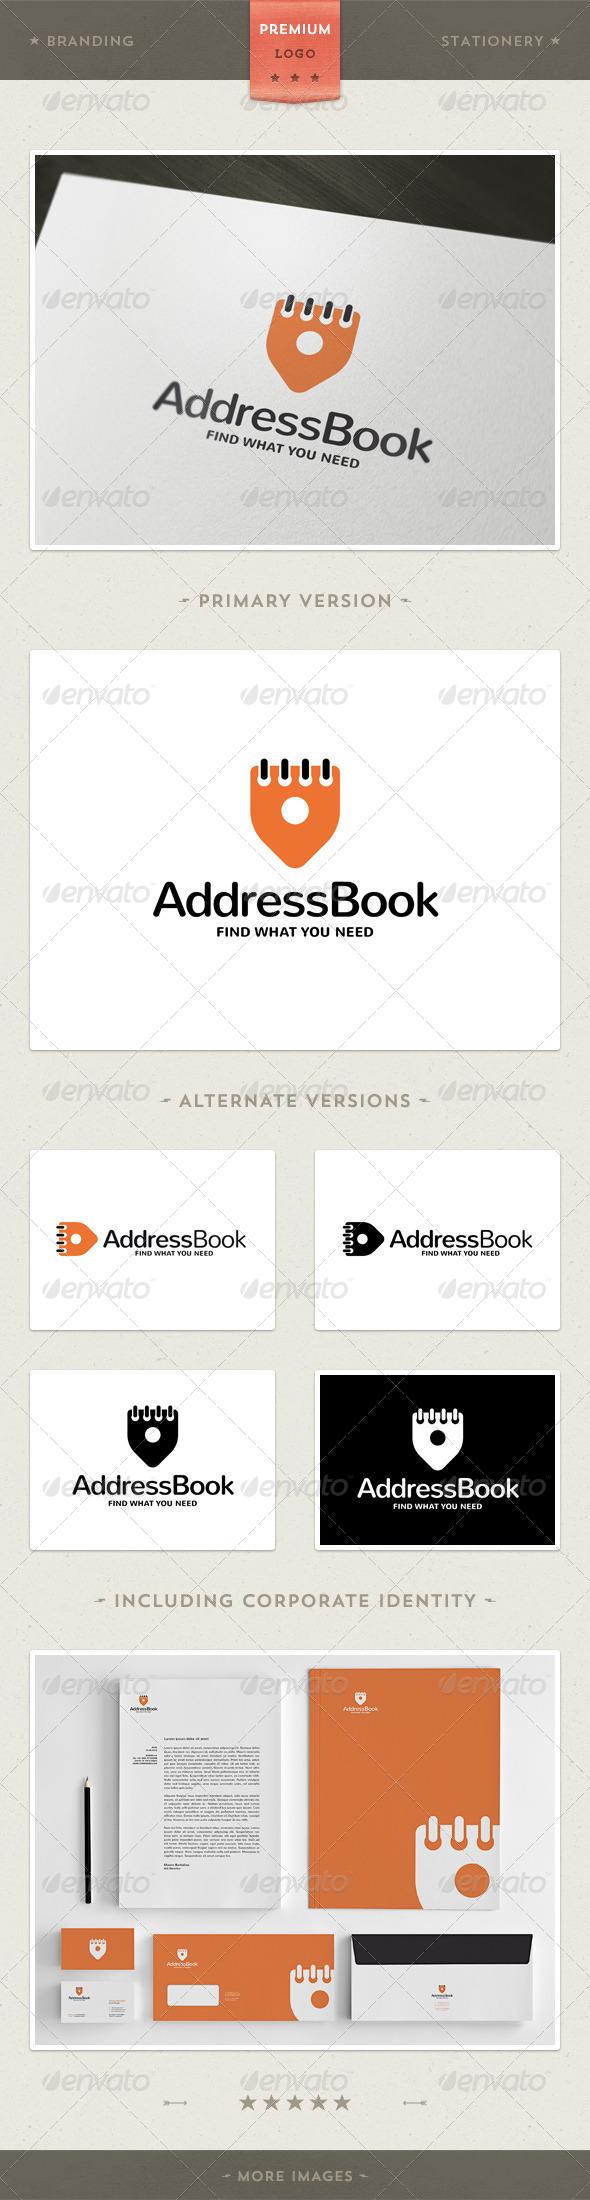 GraphicRiver Adress Book Logo & Corporate Identity 4241083